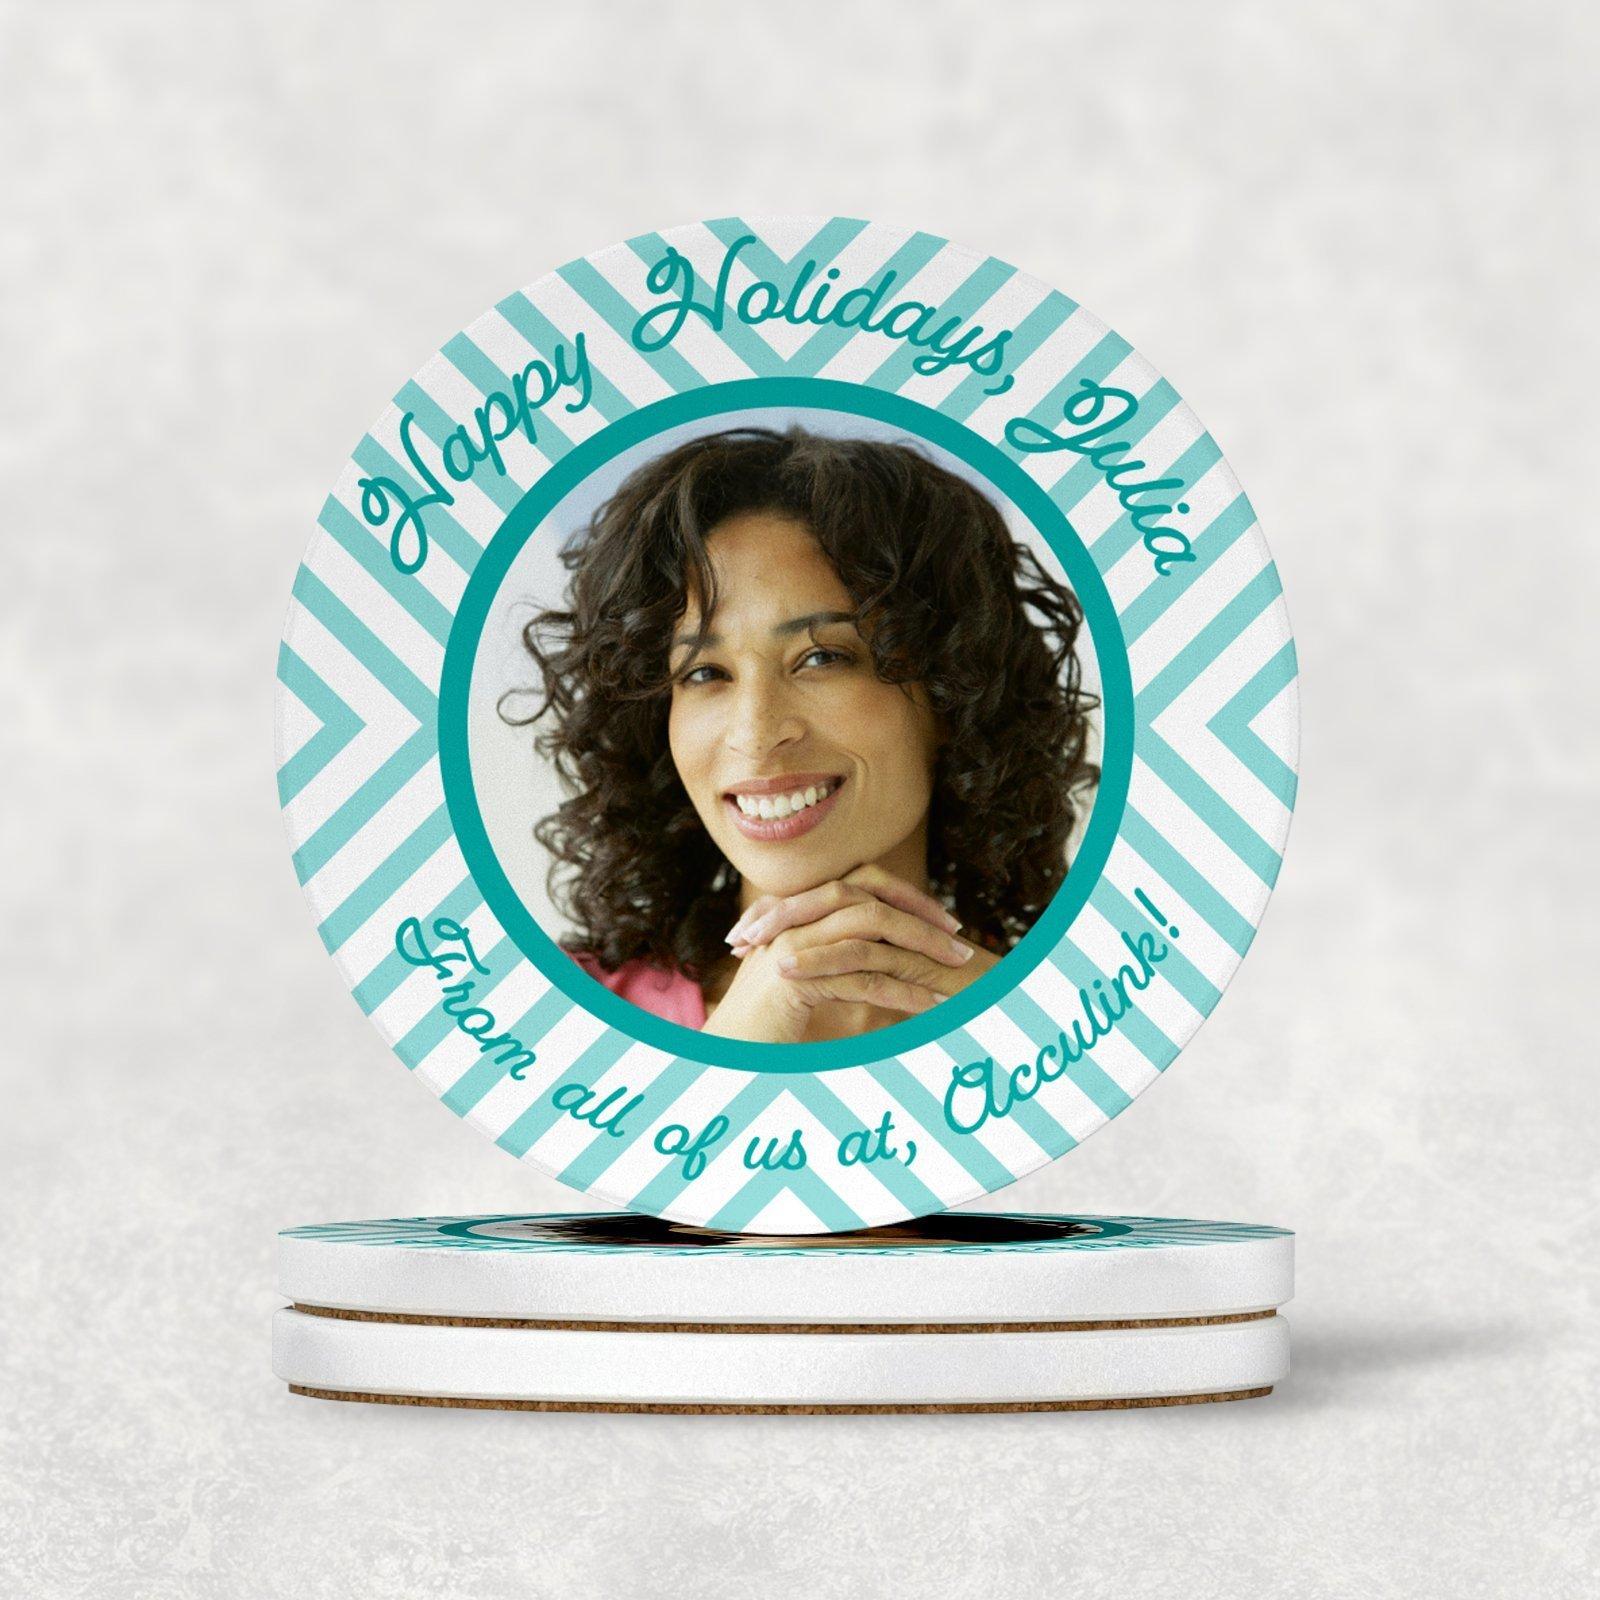 Sandstone Coaster Corporate Gift Idea